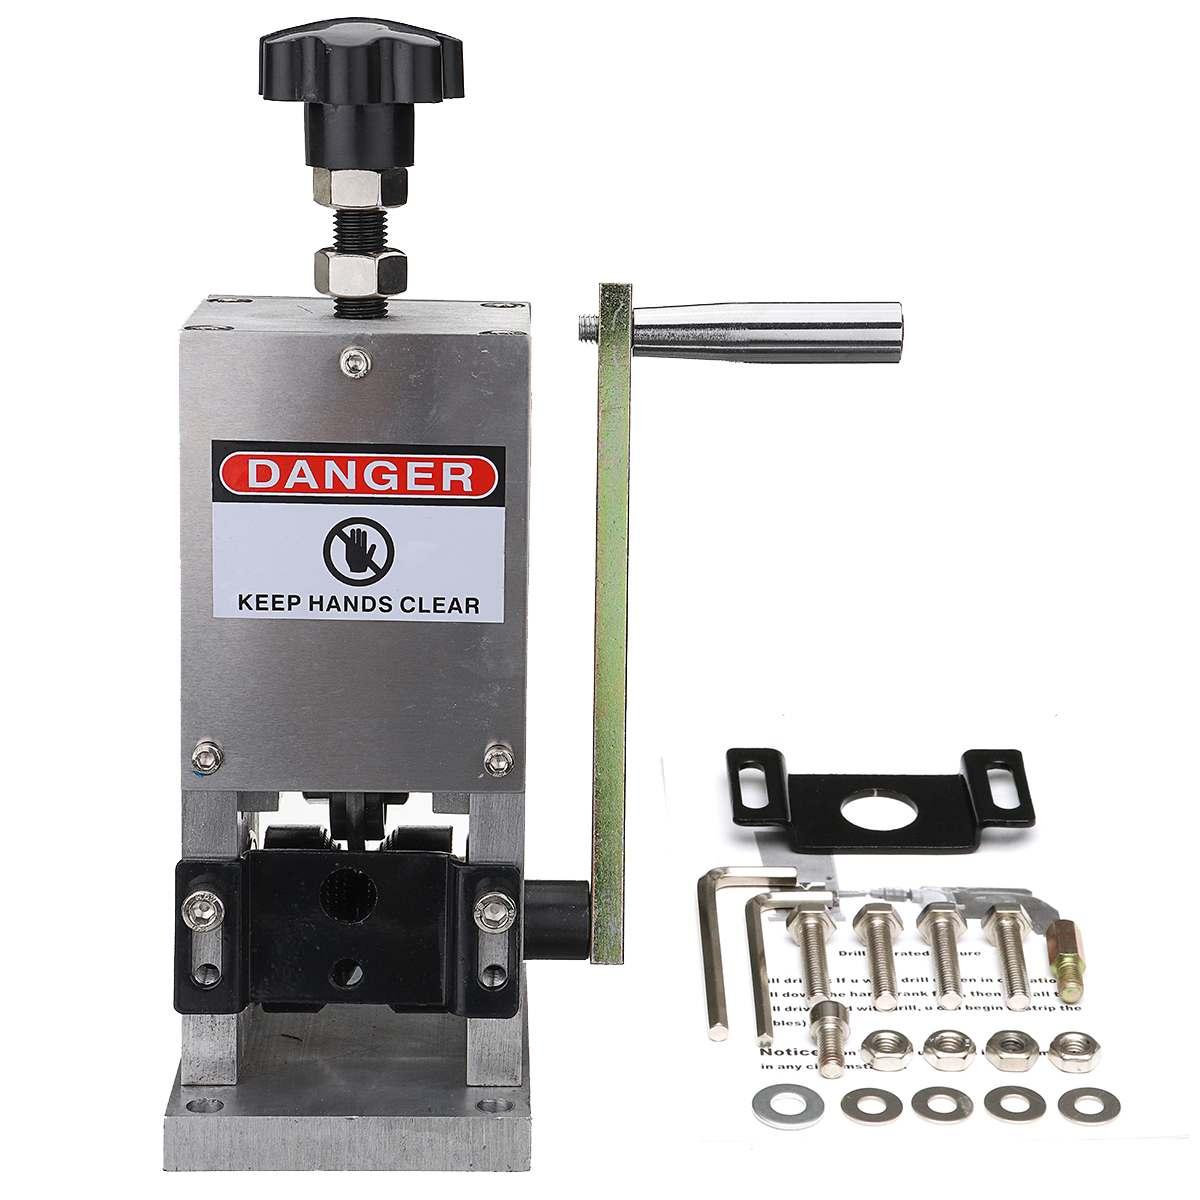 maquina de friso do cabo de fio do controle da mao e maquina de peeling para